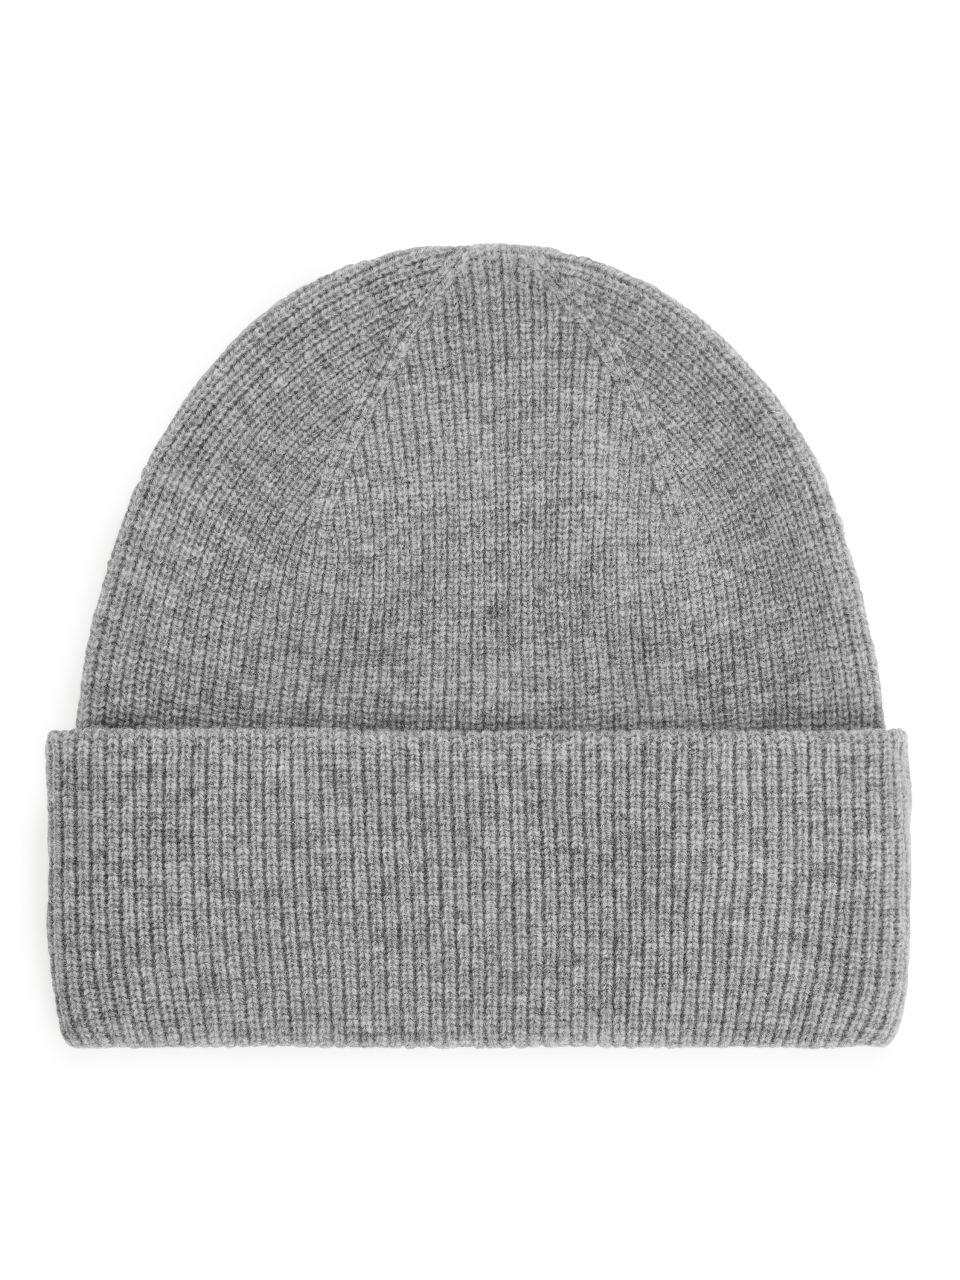 Fold Up Wool Beanie - Grey